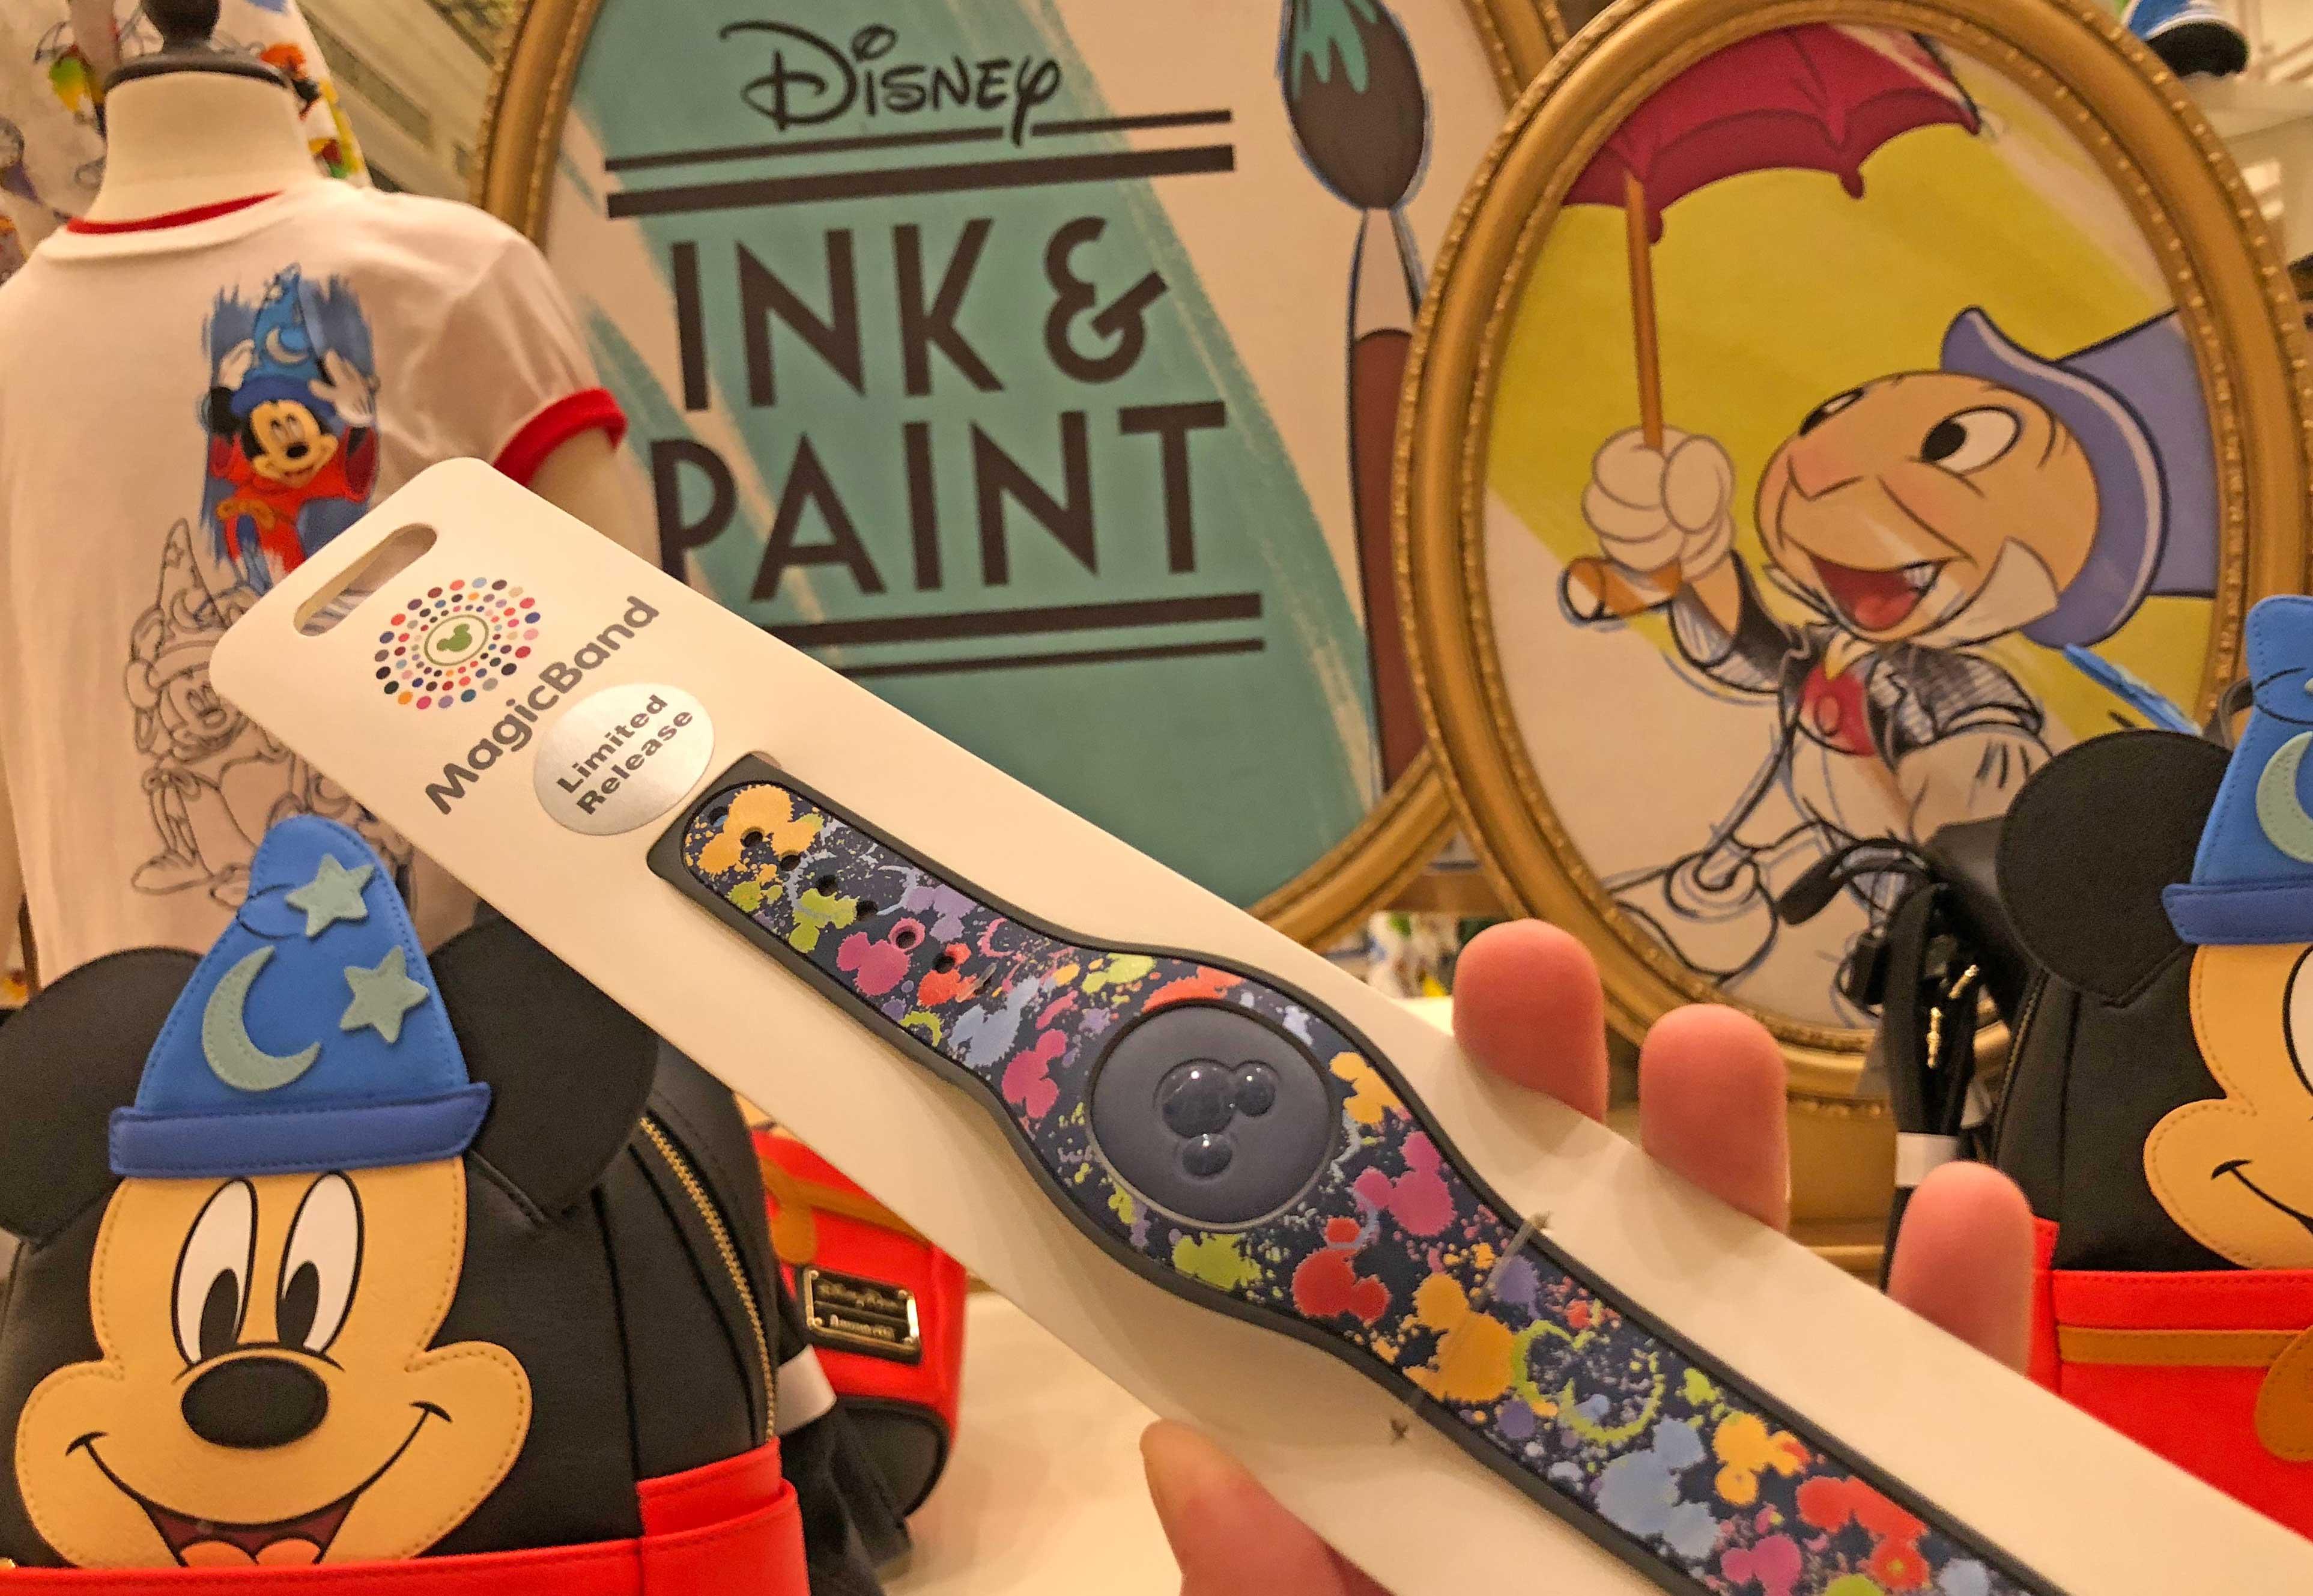 Disney Soft Touch Magnet Walt Disney World Letters